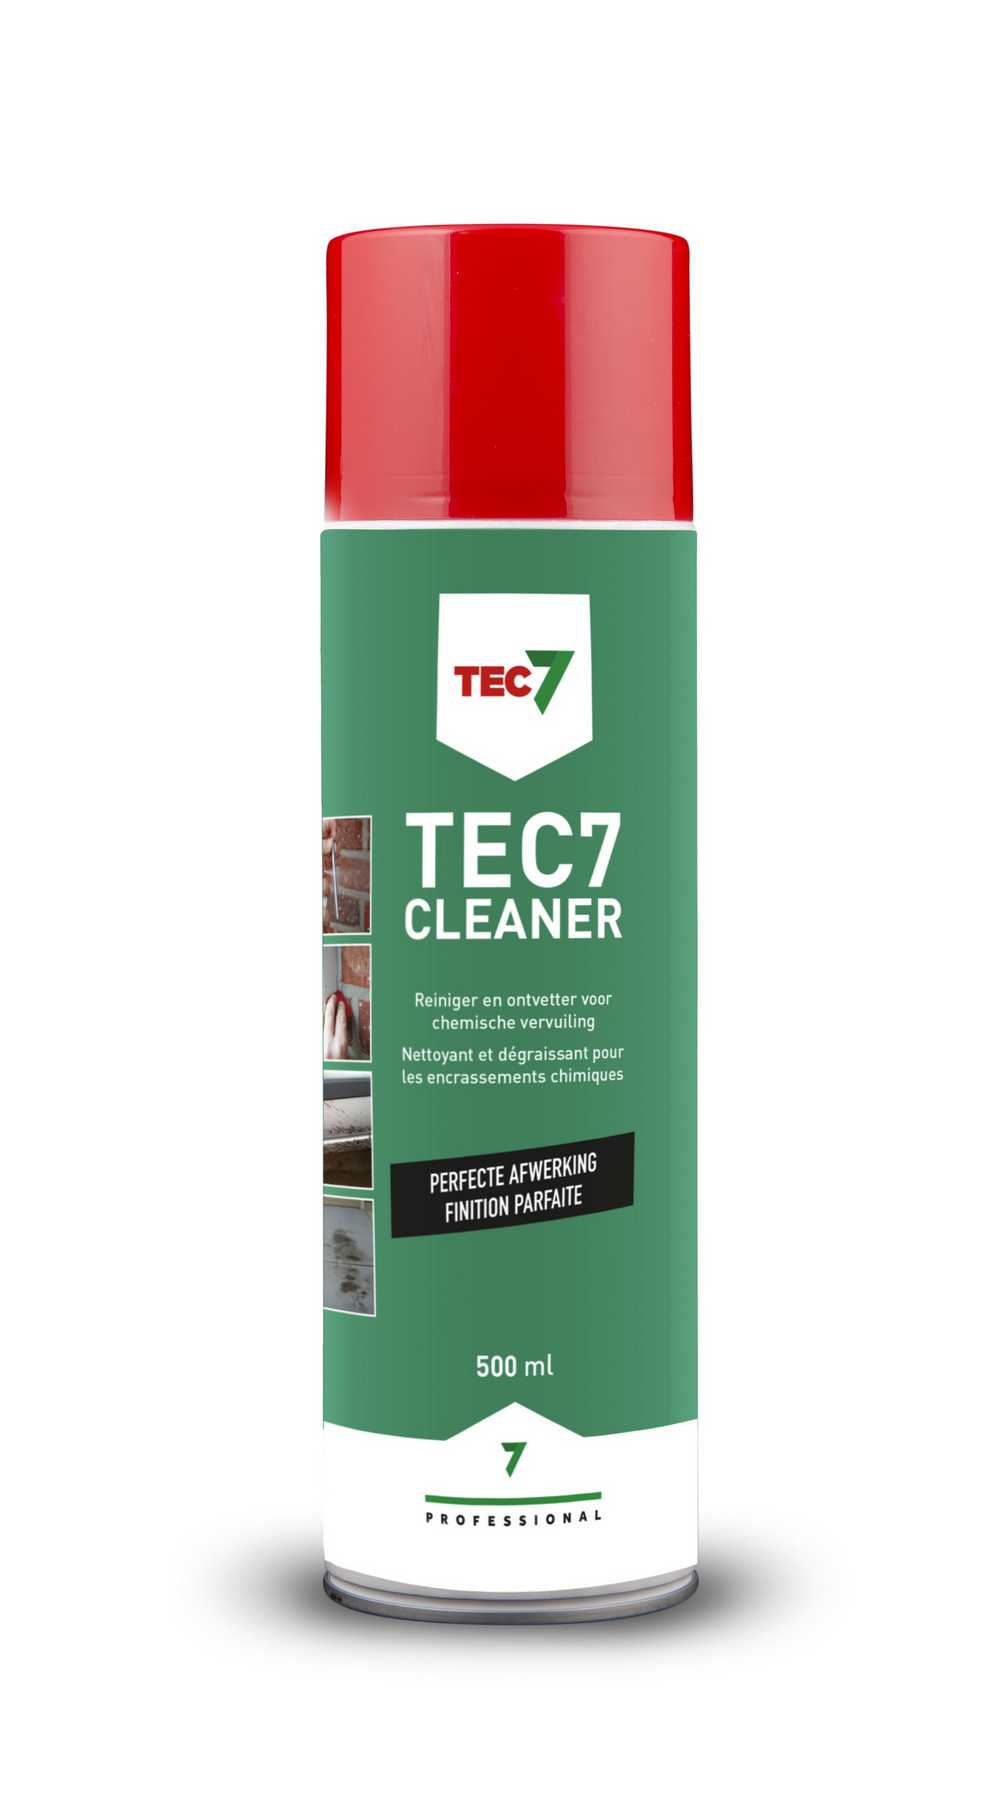 TEC7 Cleaner Veilige solventreiniger bus 500 ml